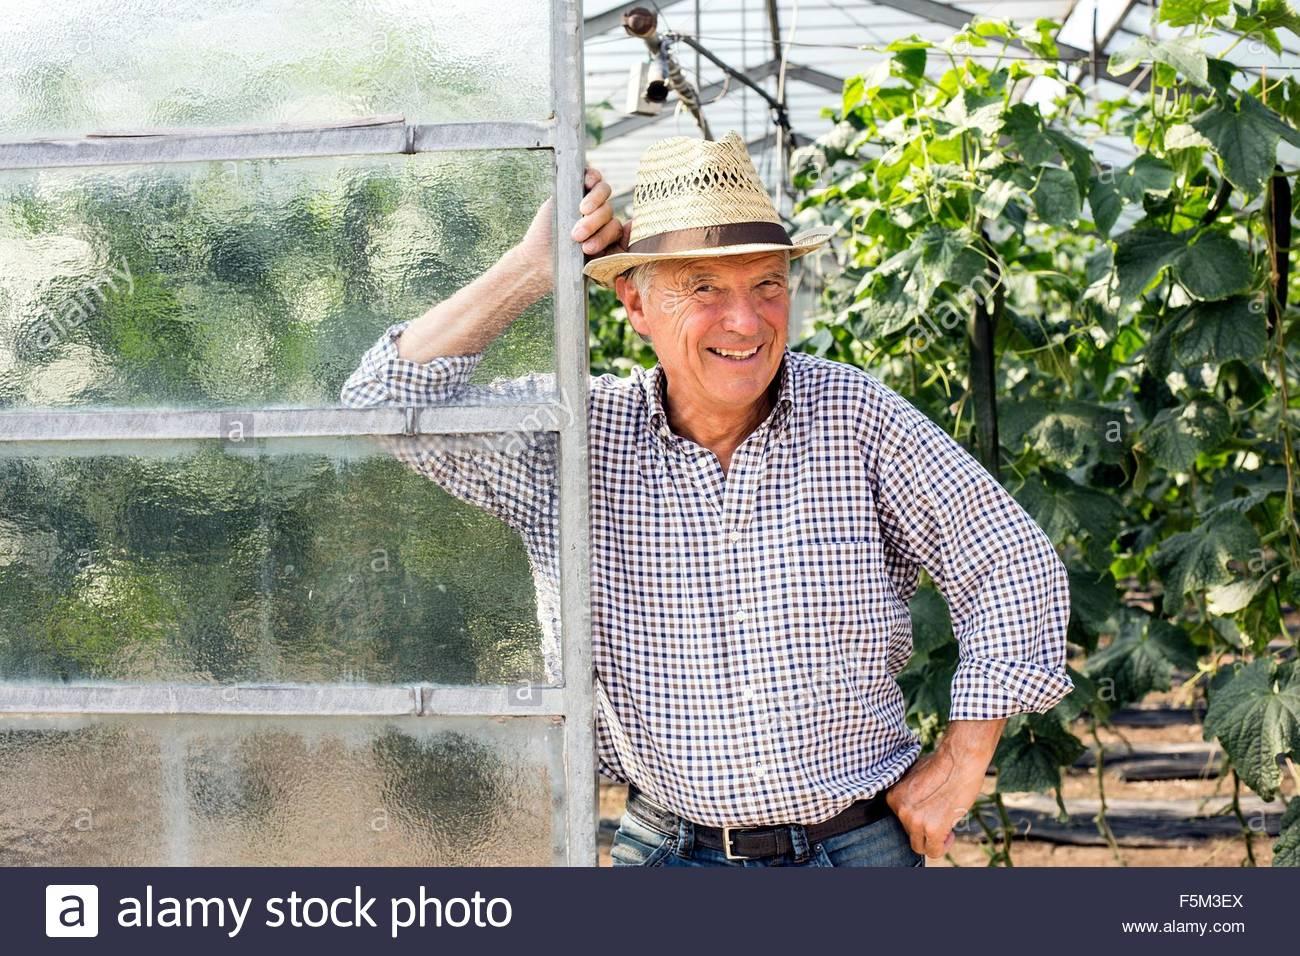 Senior man wearing hat appuyé contre la porte de hothouse looking at camera smiling Photo Stock